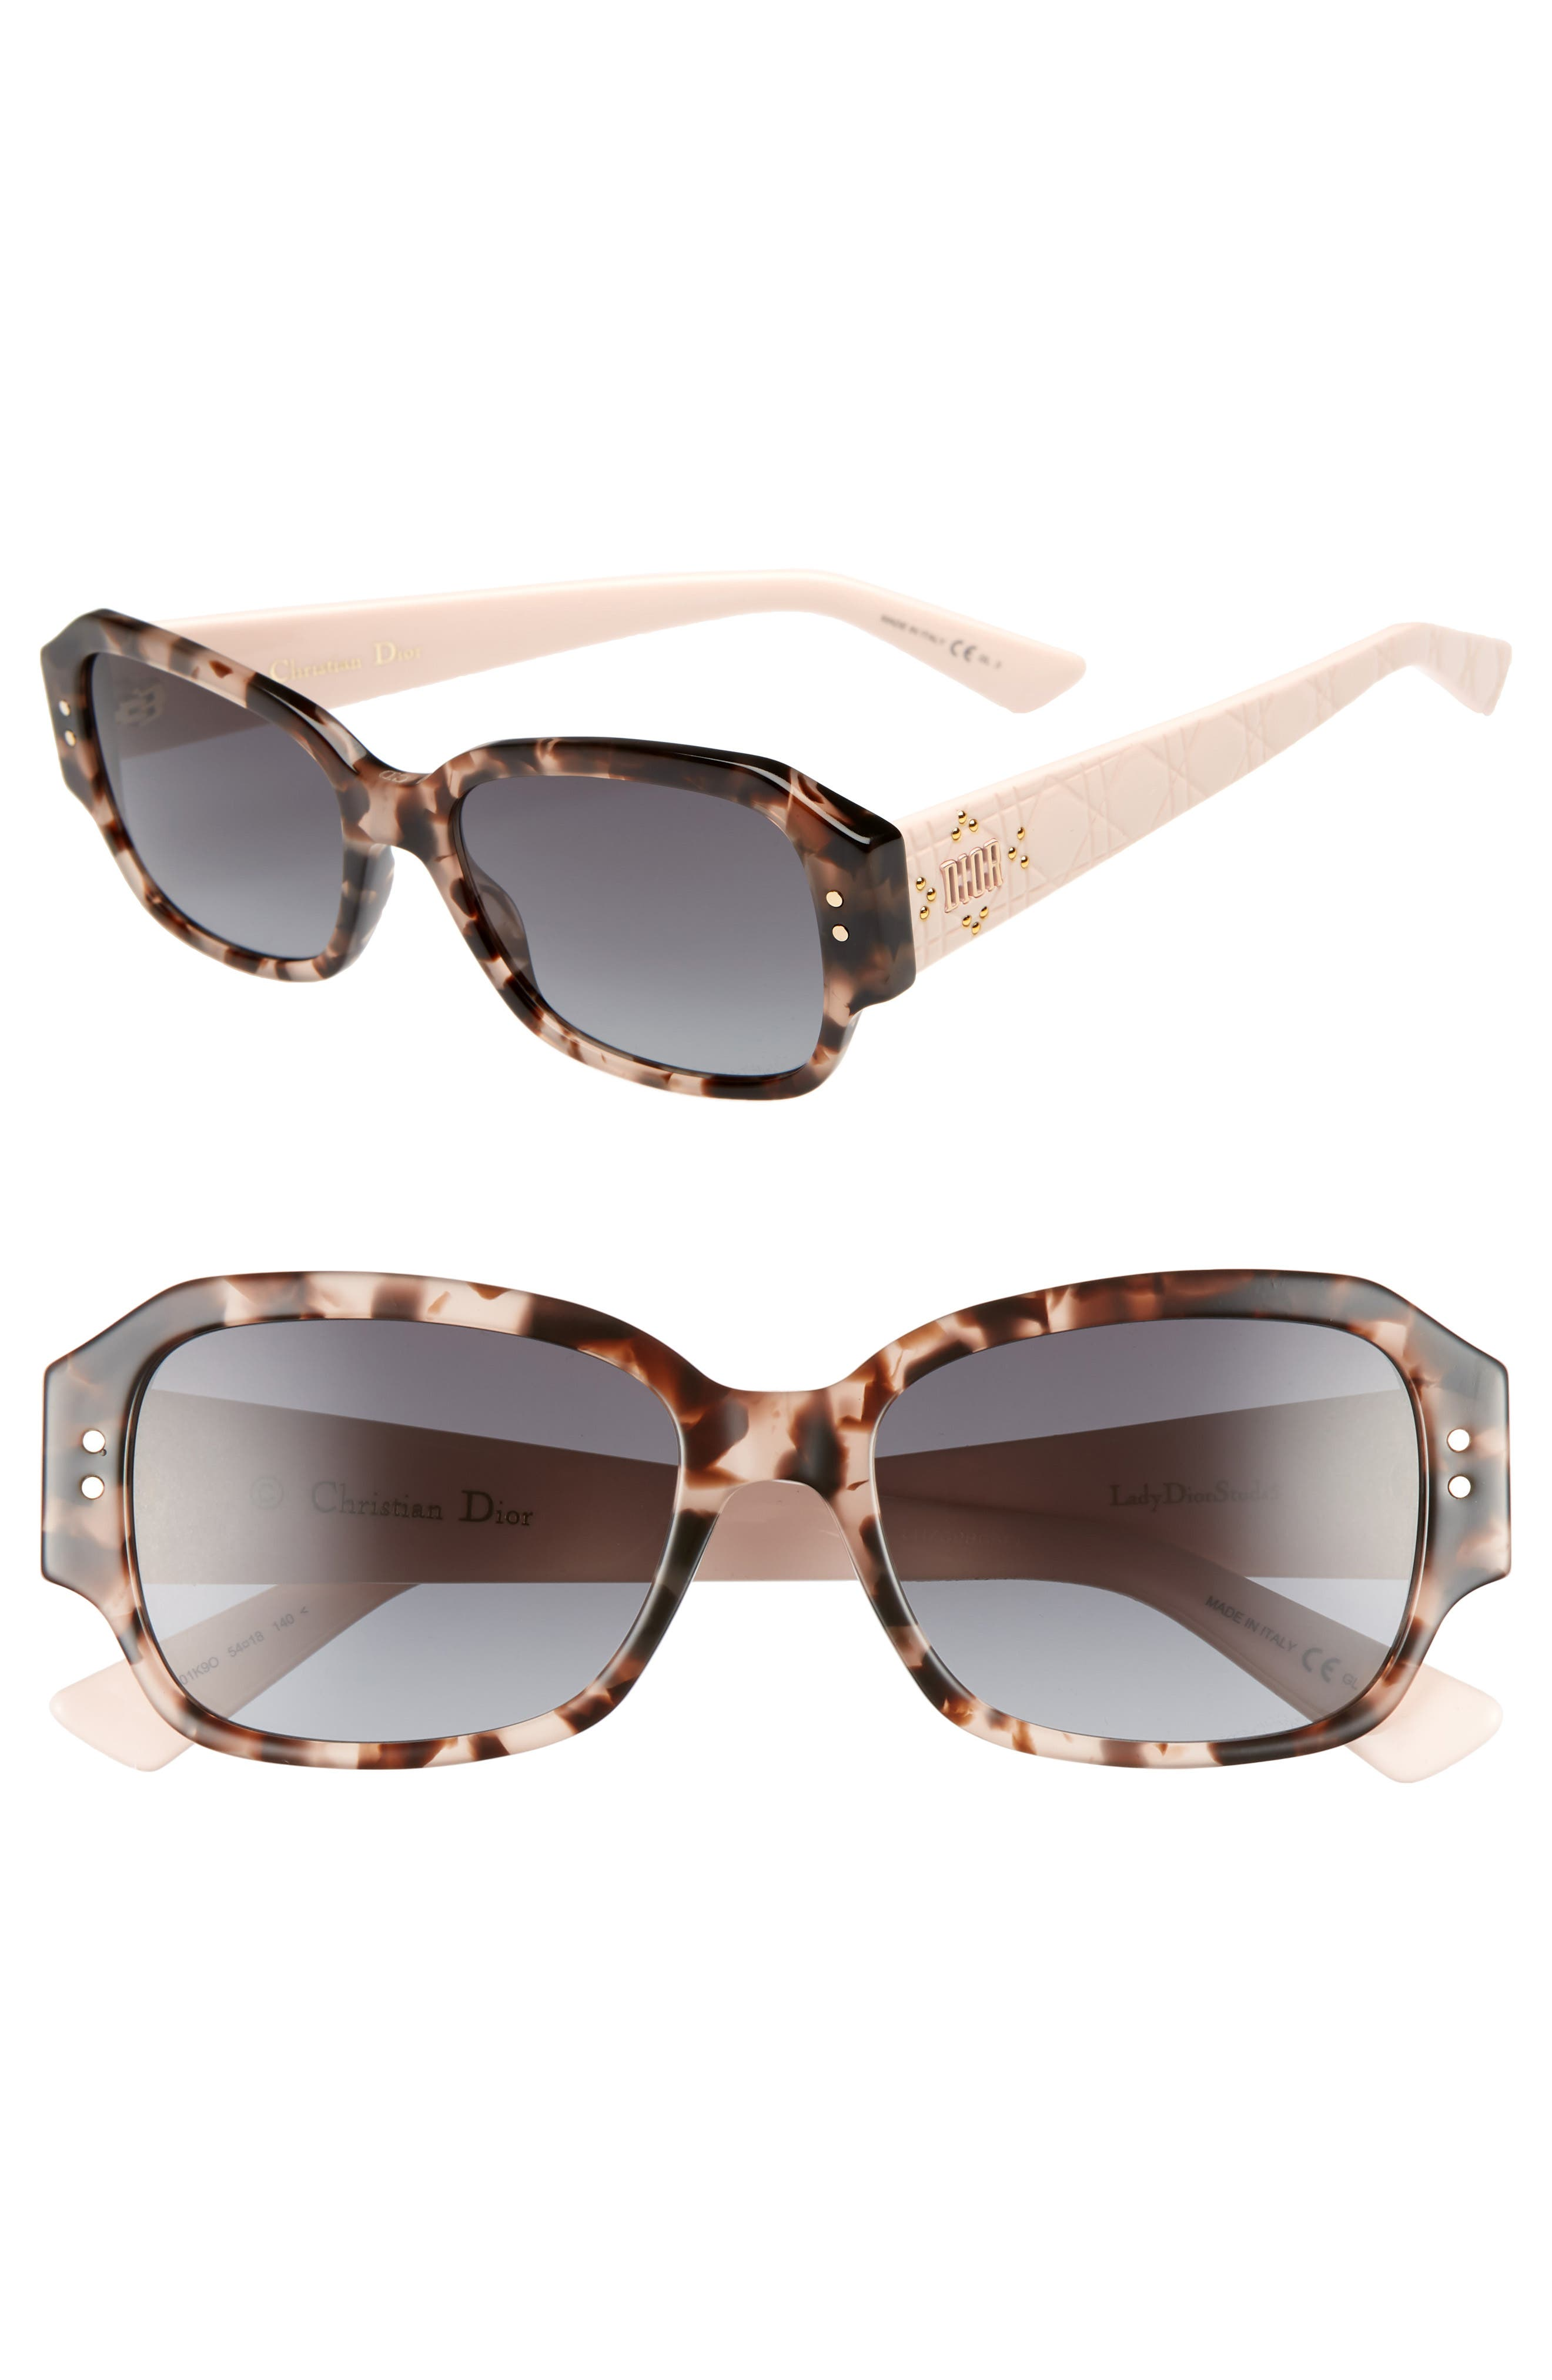 Ladydiorstuds5 54mm Sunglasses,                             Main thumbnail 1, color,                             HAVANA LIGHT PINK